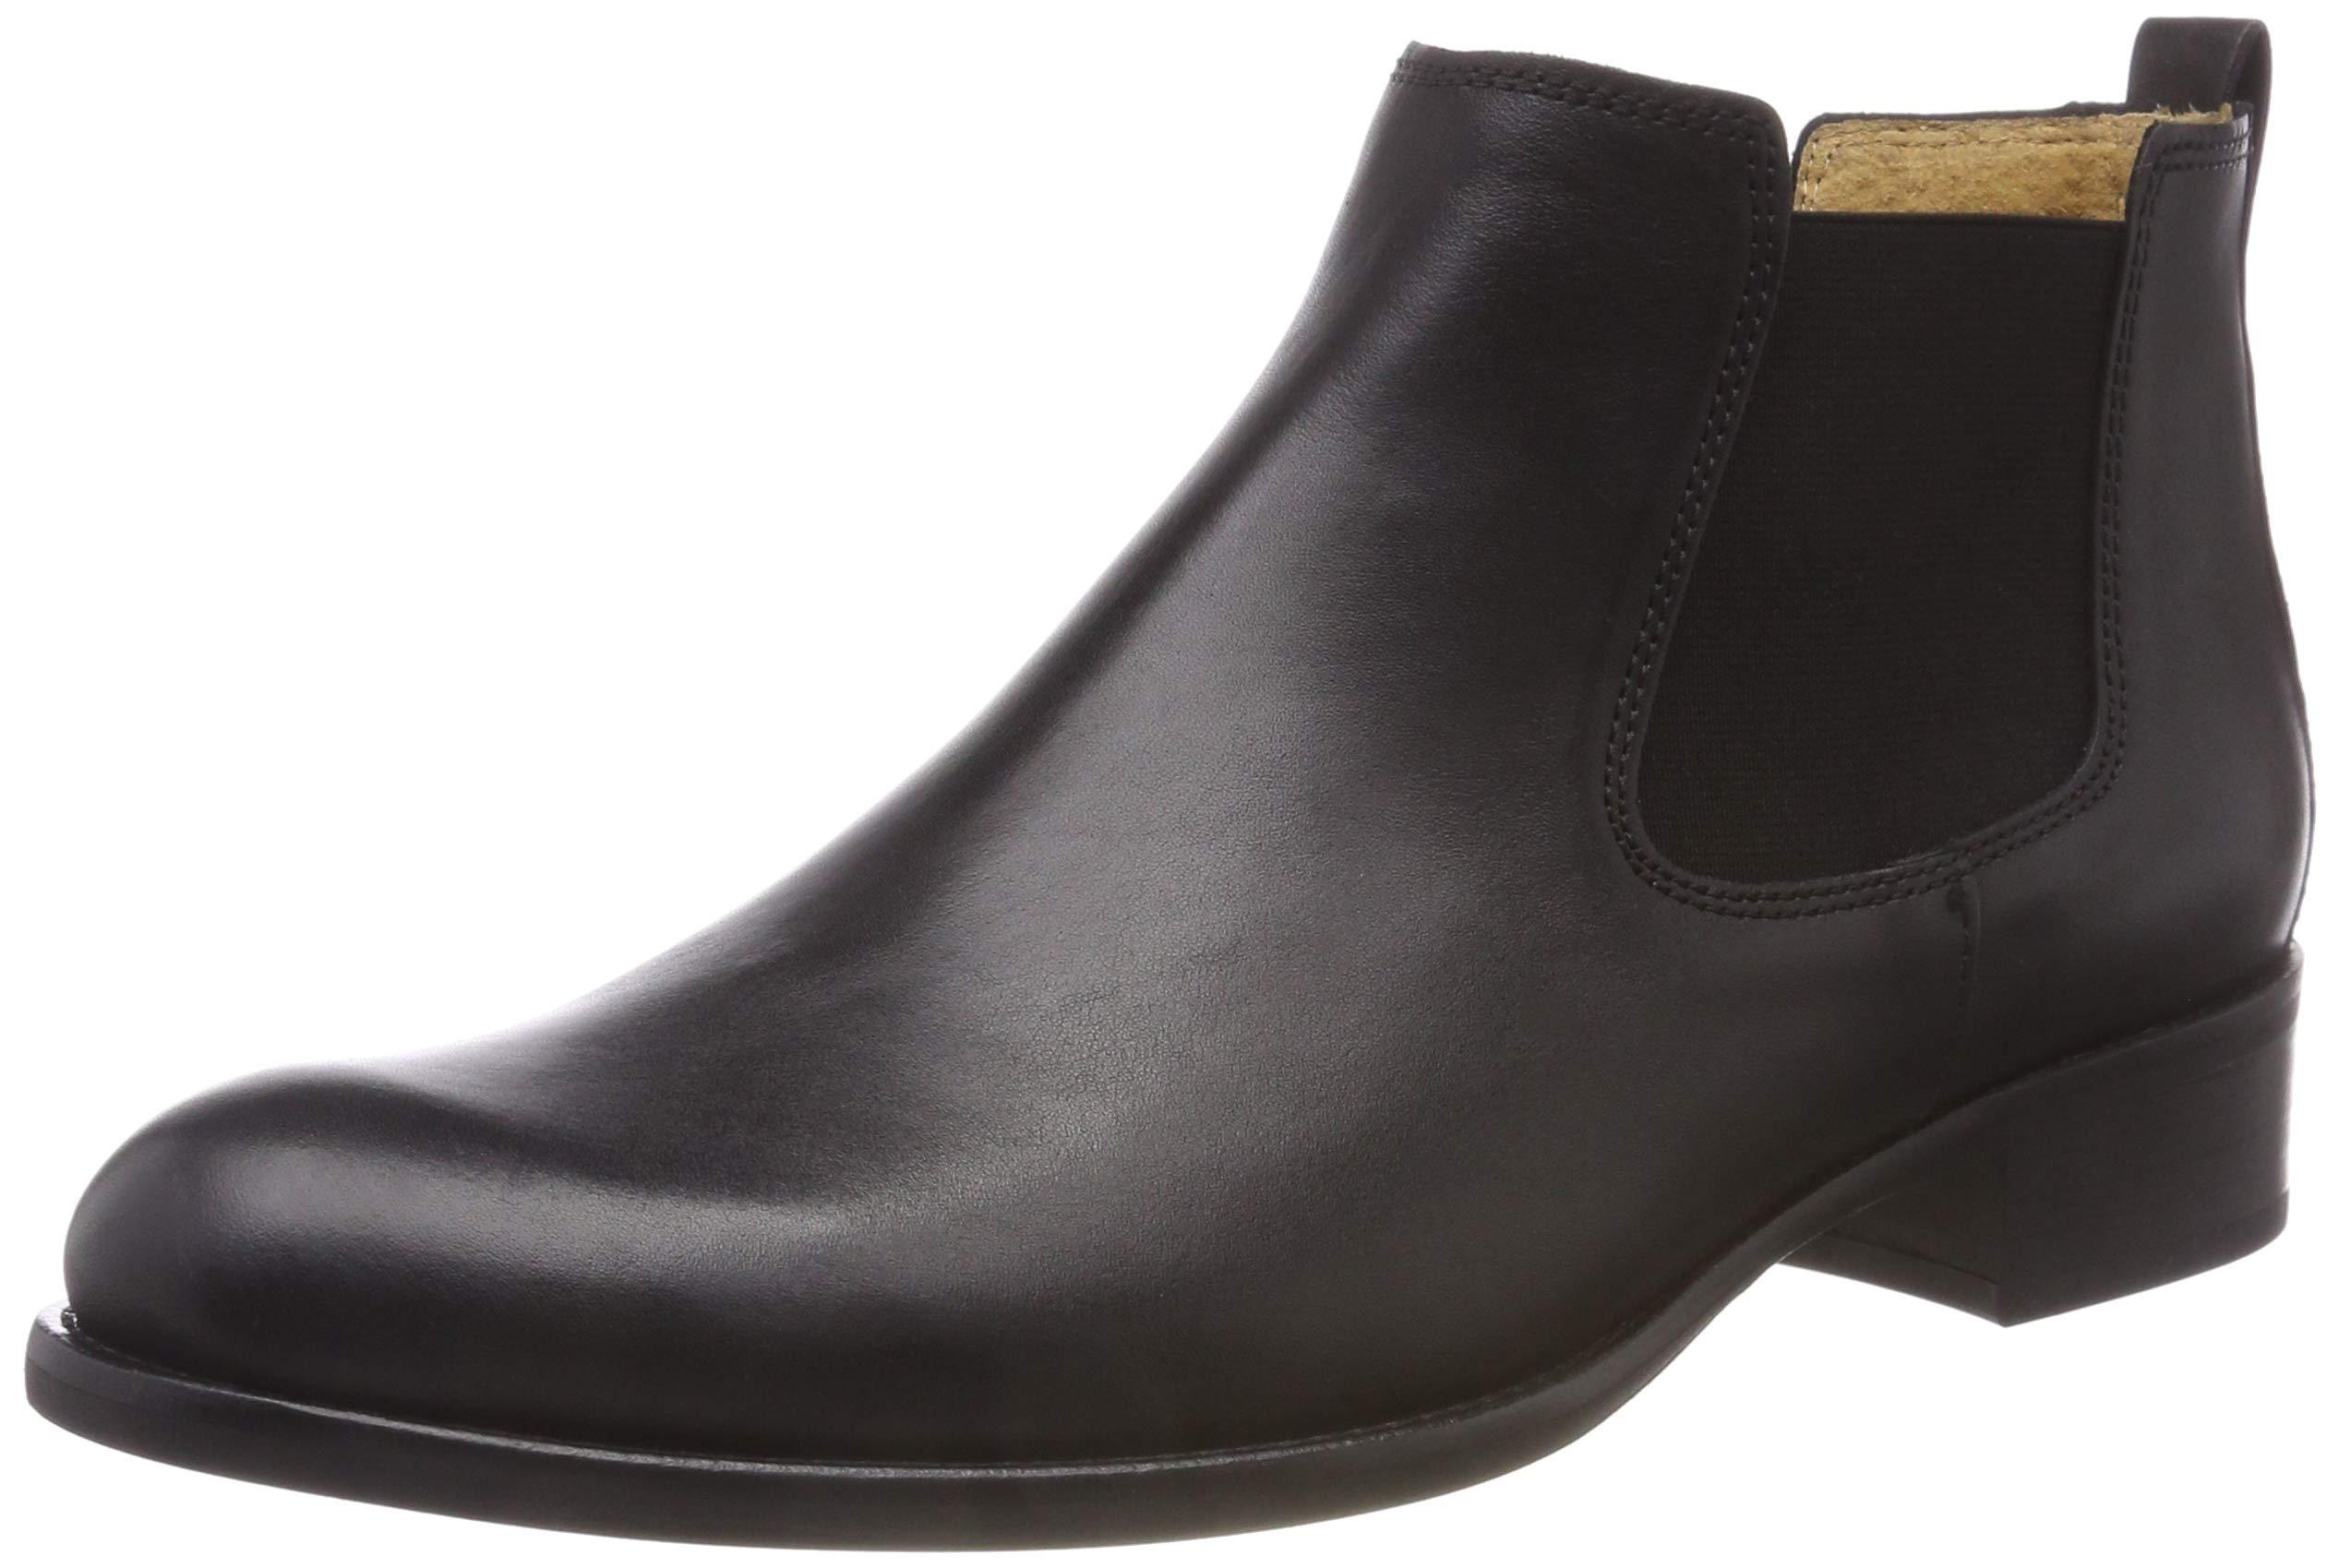 5 FashionBotines Eu 2740 Gabor Shoes FemmeNoirschwarz H29EWID